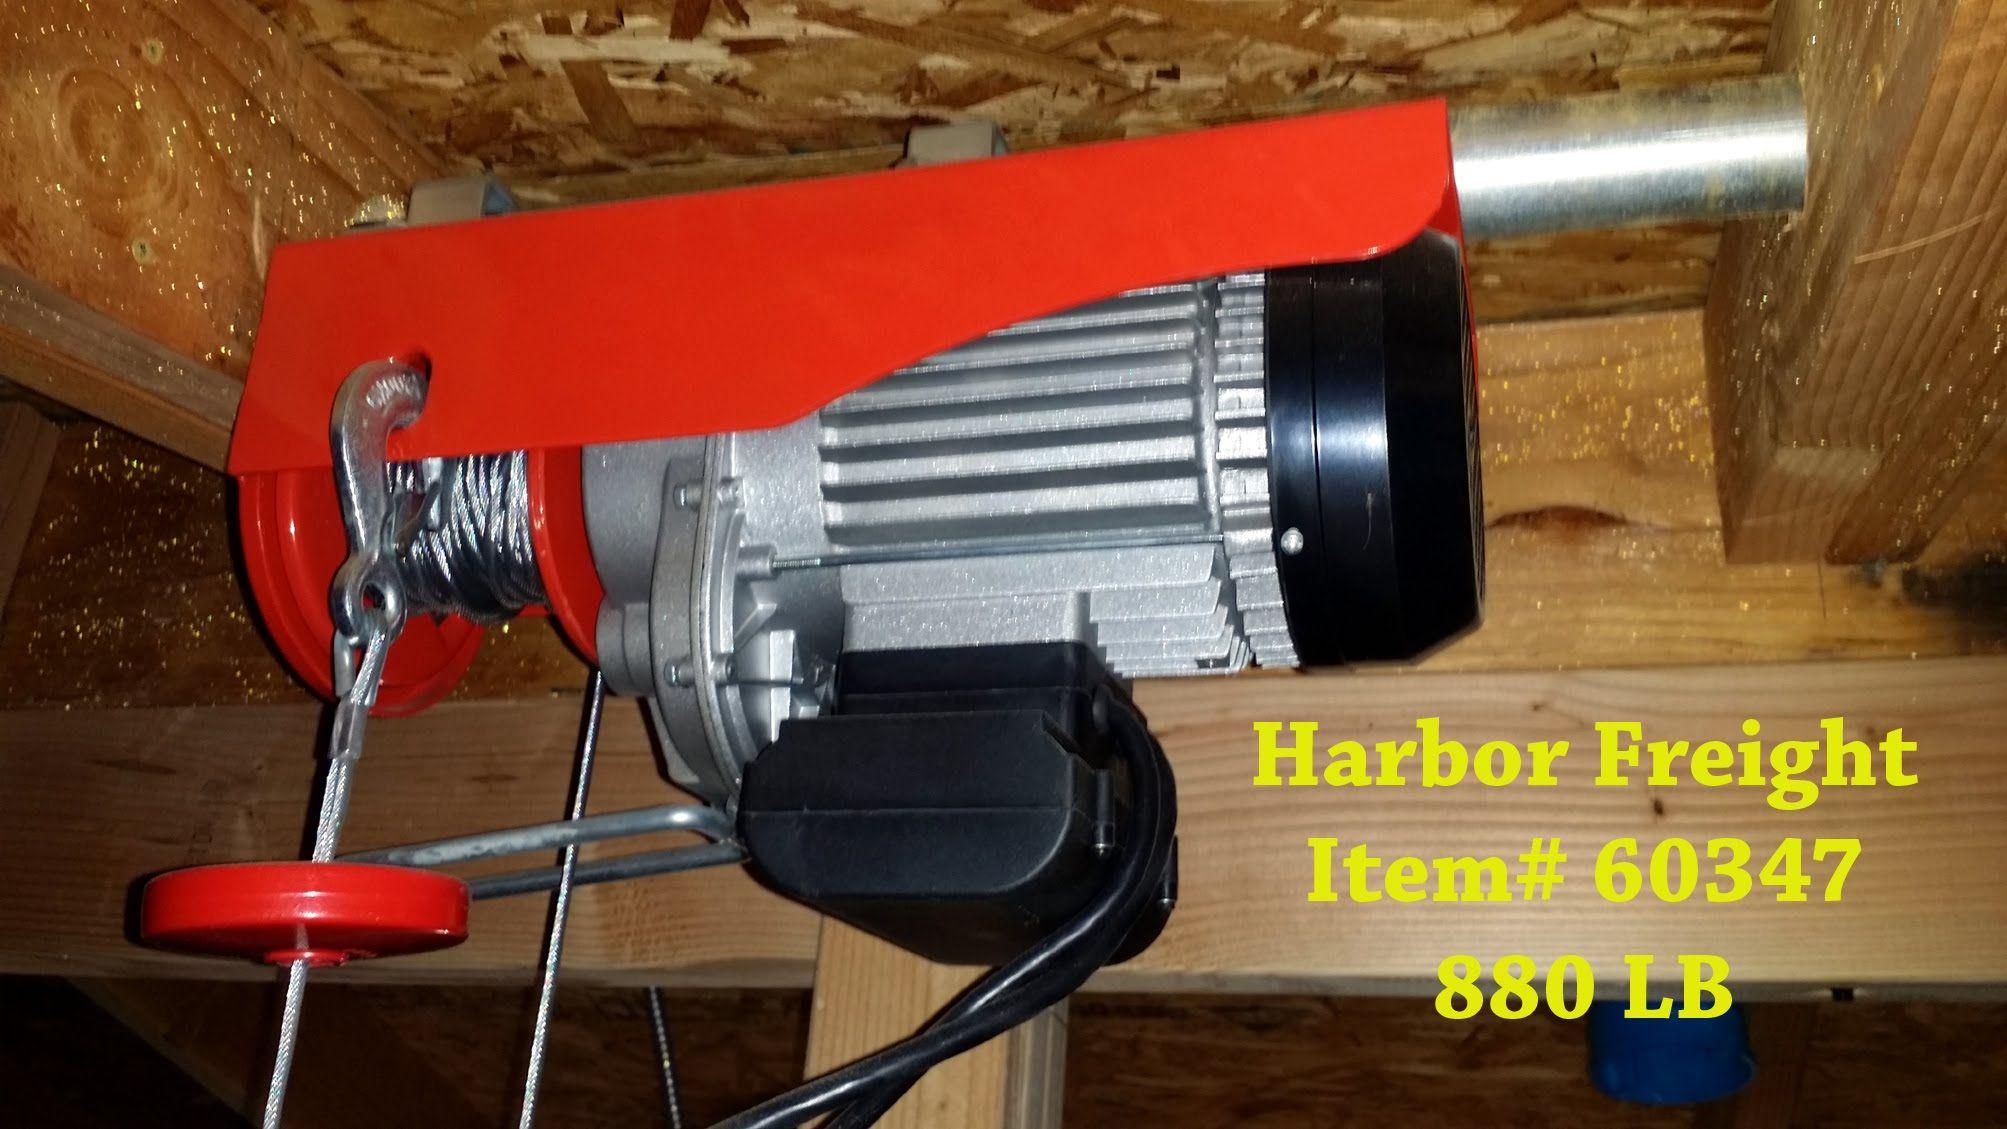 medium resolution of harbor freight 60347 880 lb winch